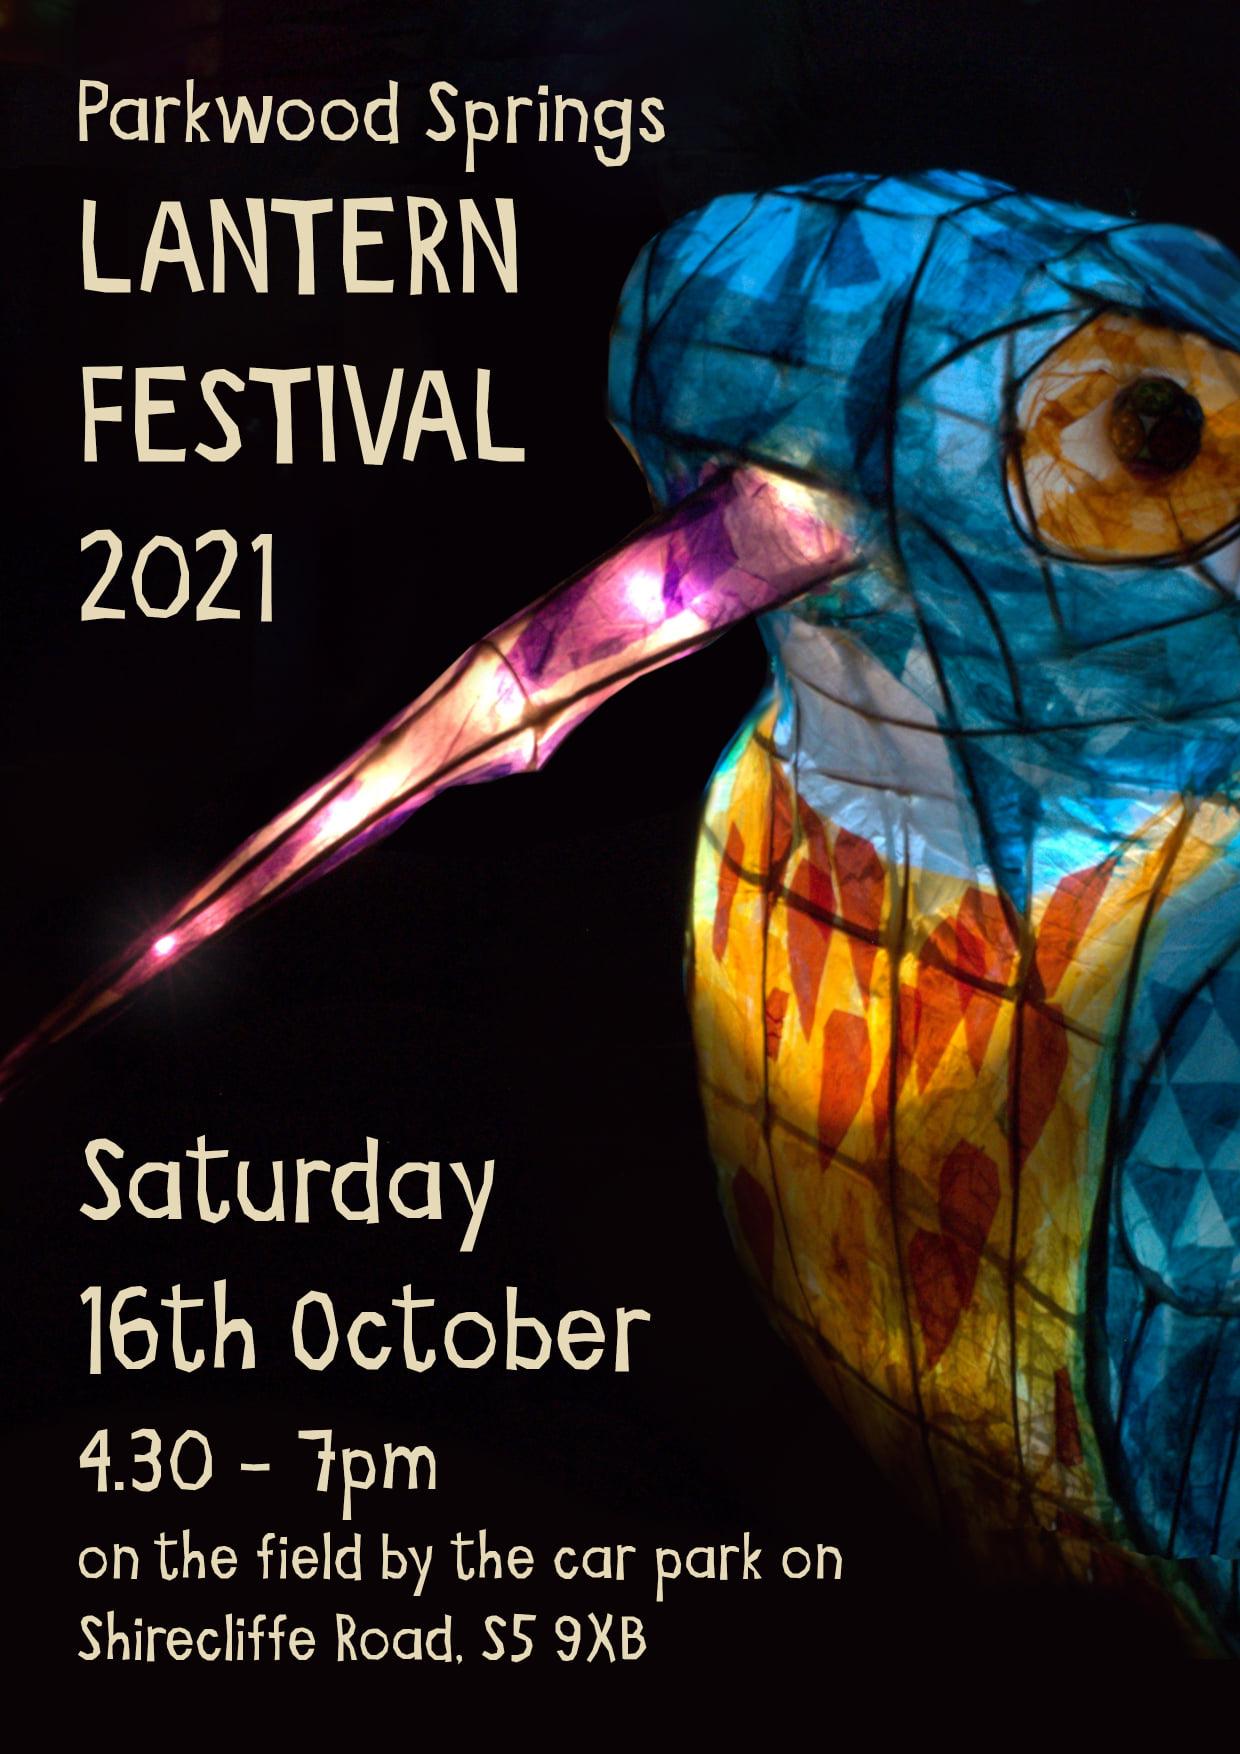 Lantern Festival flyer